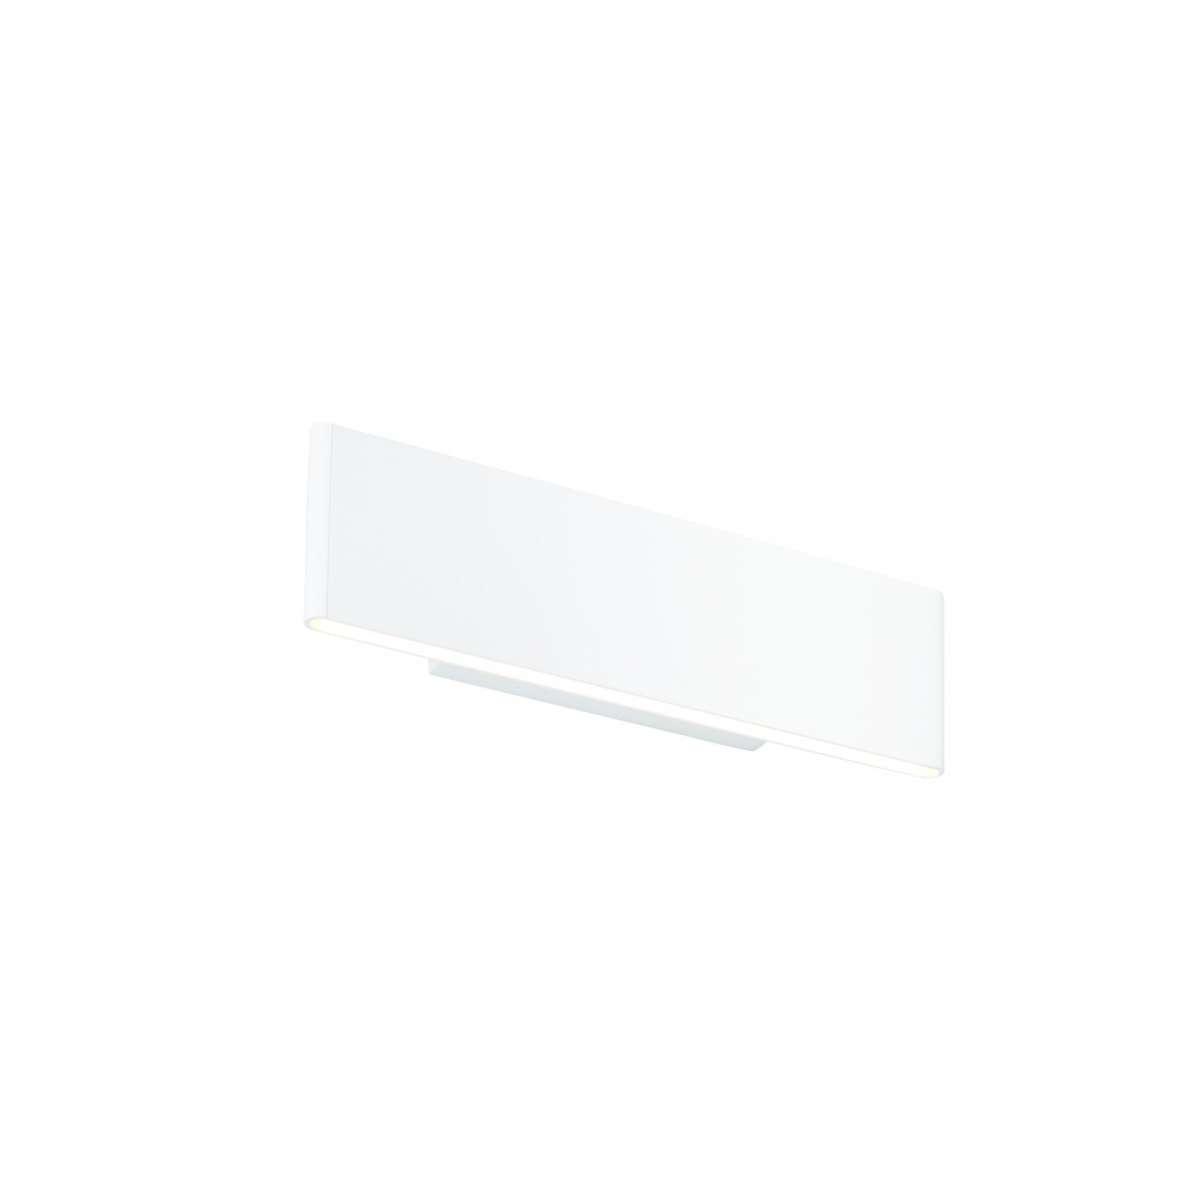 Bodhi Matt White Wall Light 285mm 5.5W Warm White